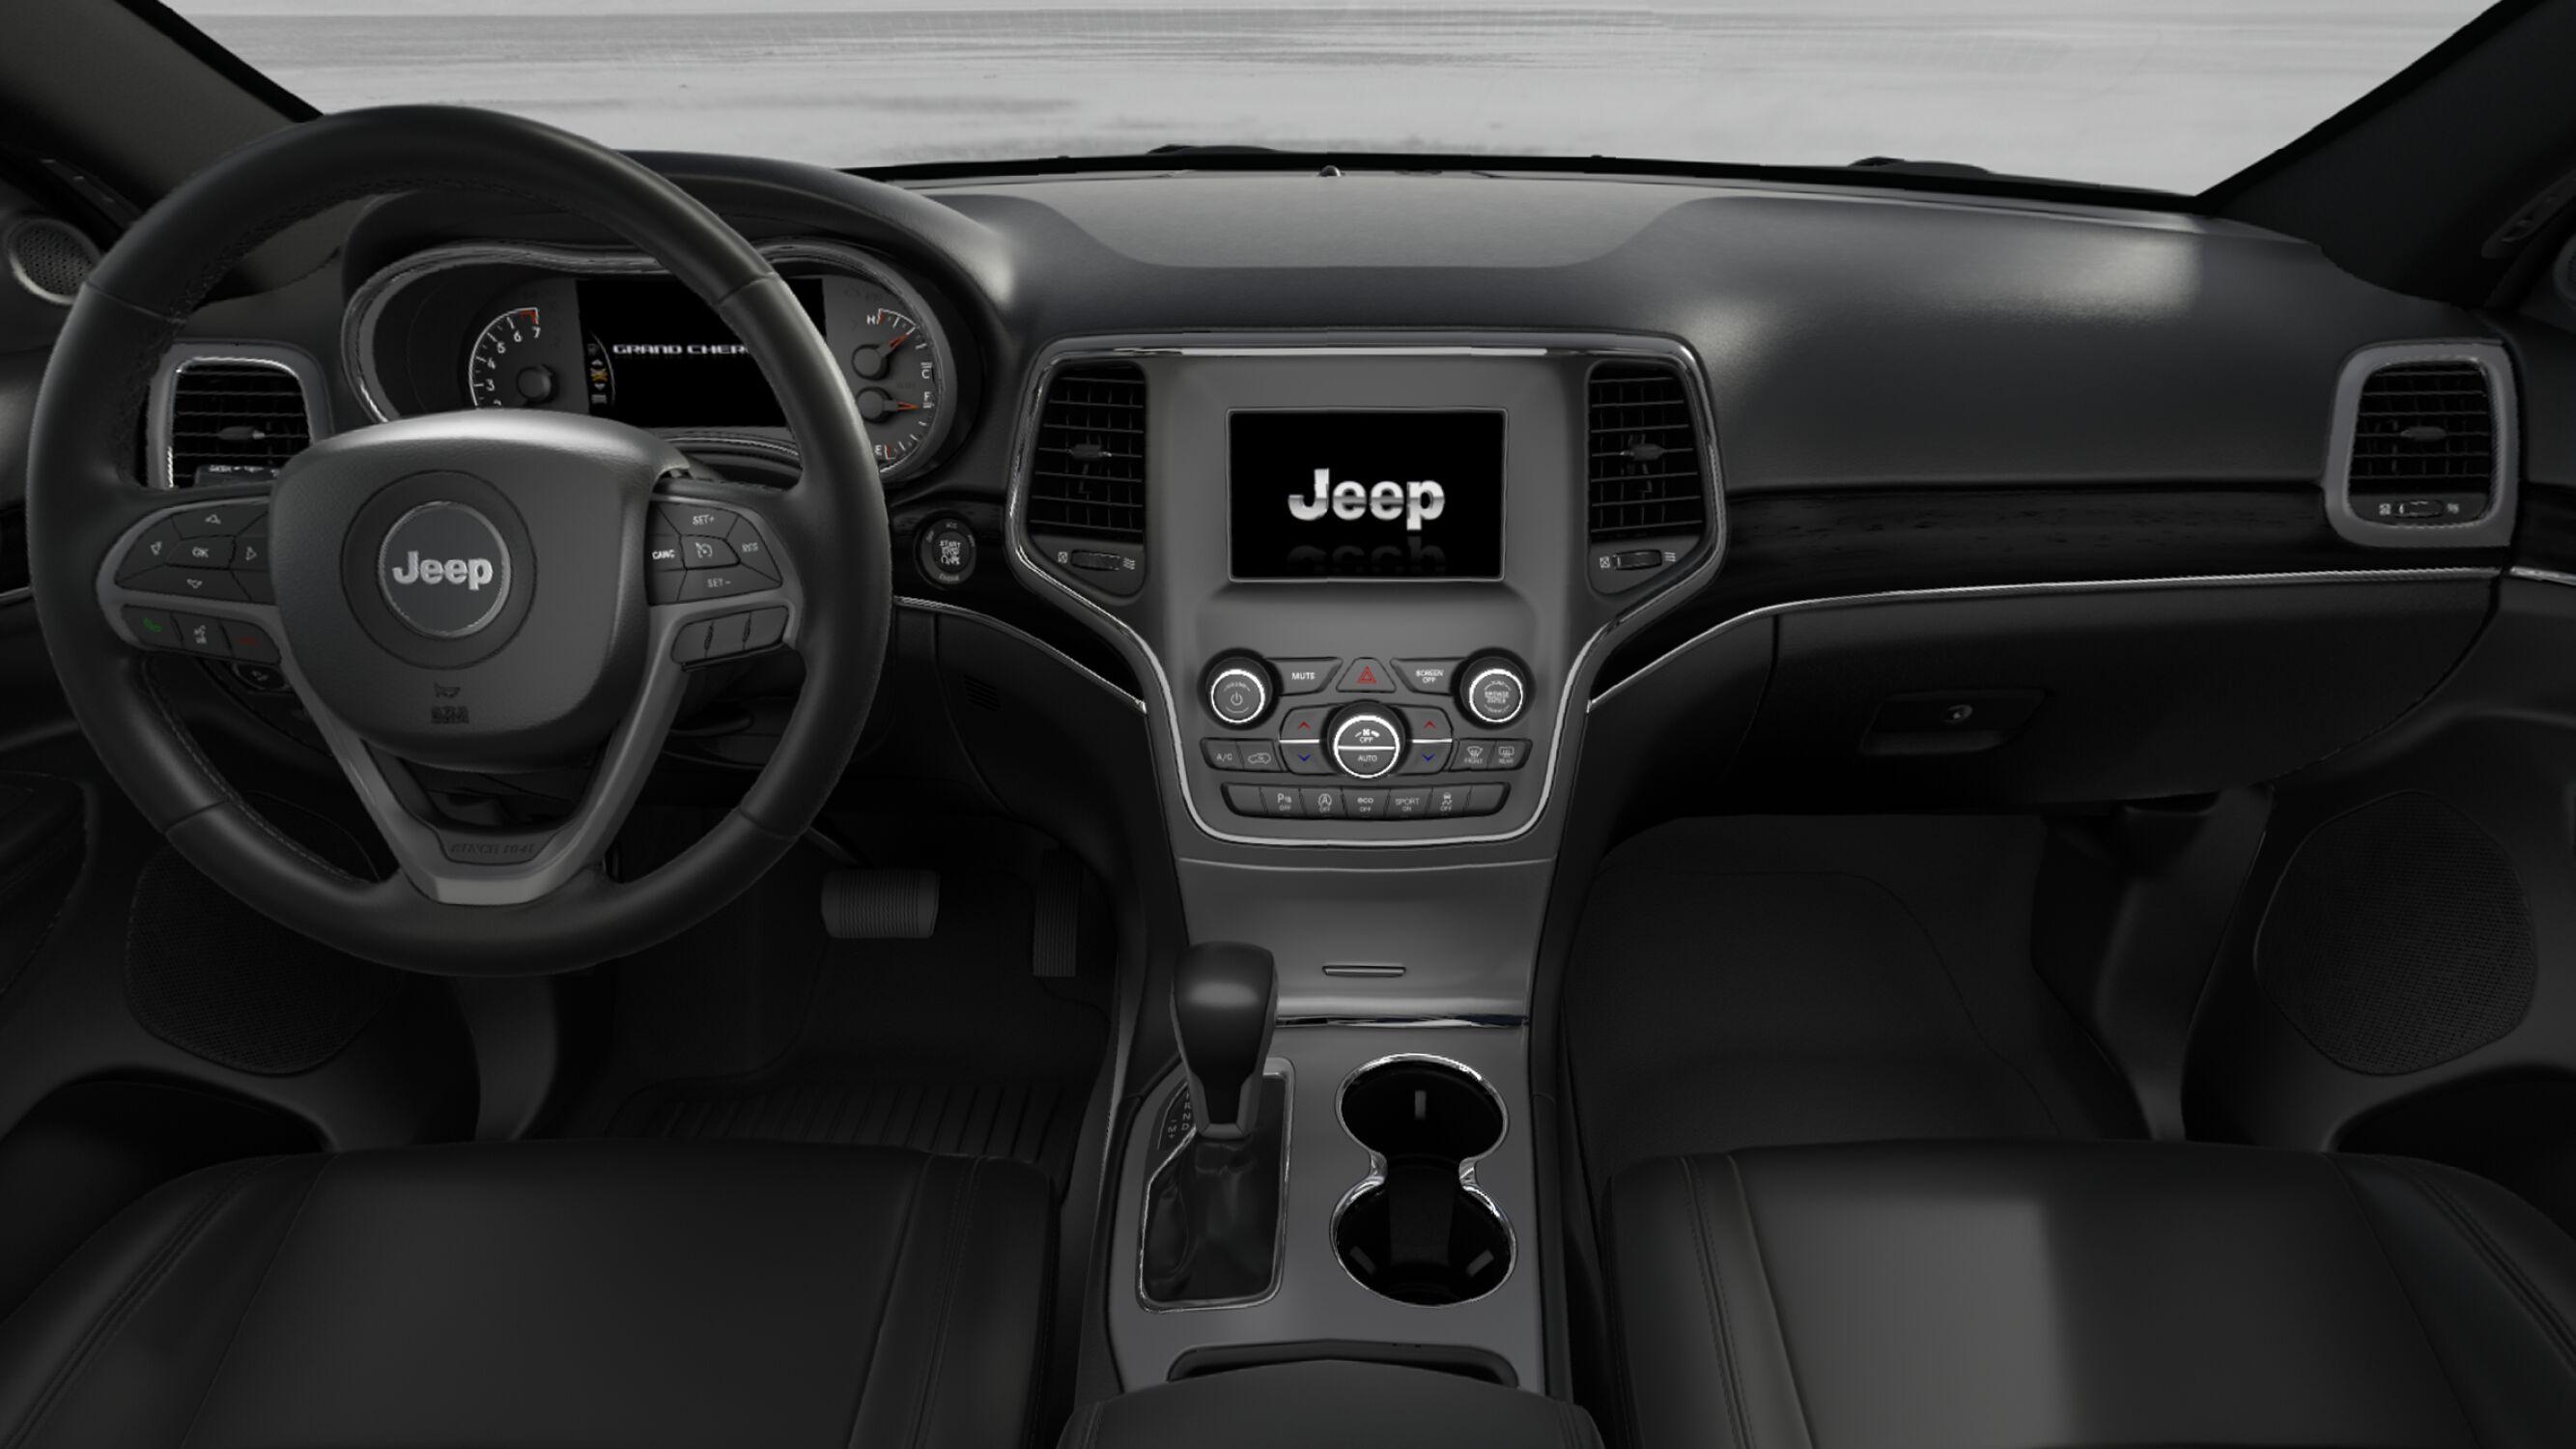 jeep grand cherokee 2014 interior psoriasisguru com jeep cherokee interior 2015 jeep cherokee interior 2018